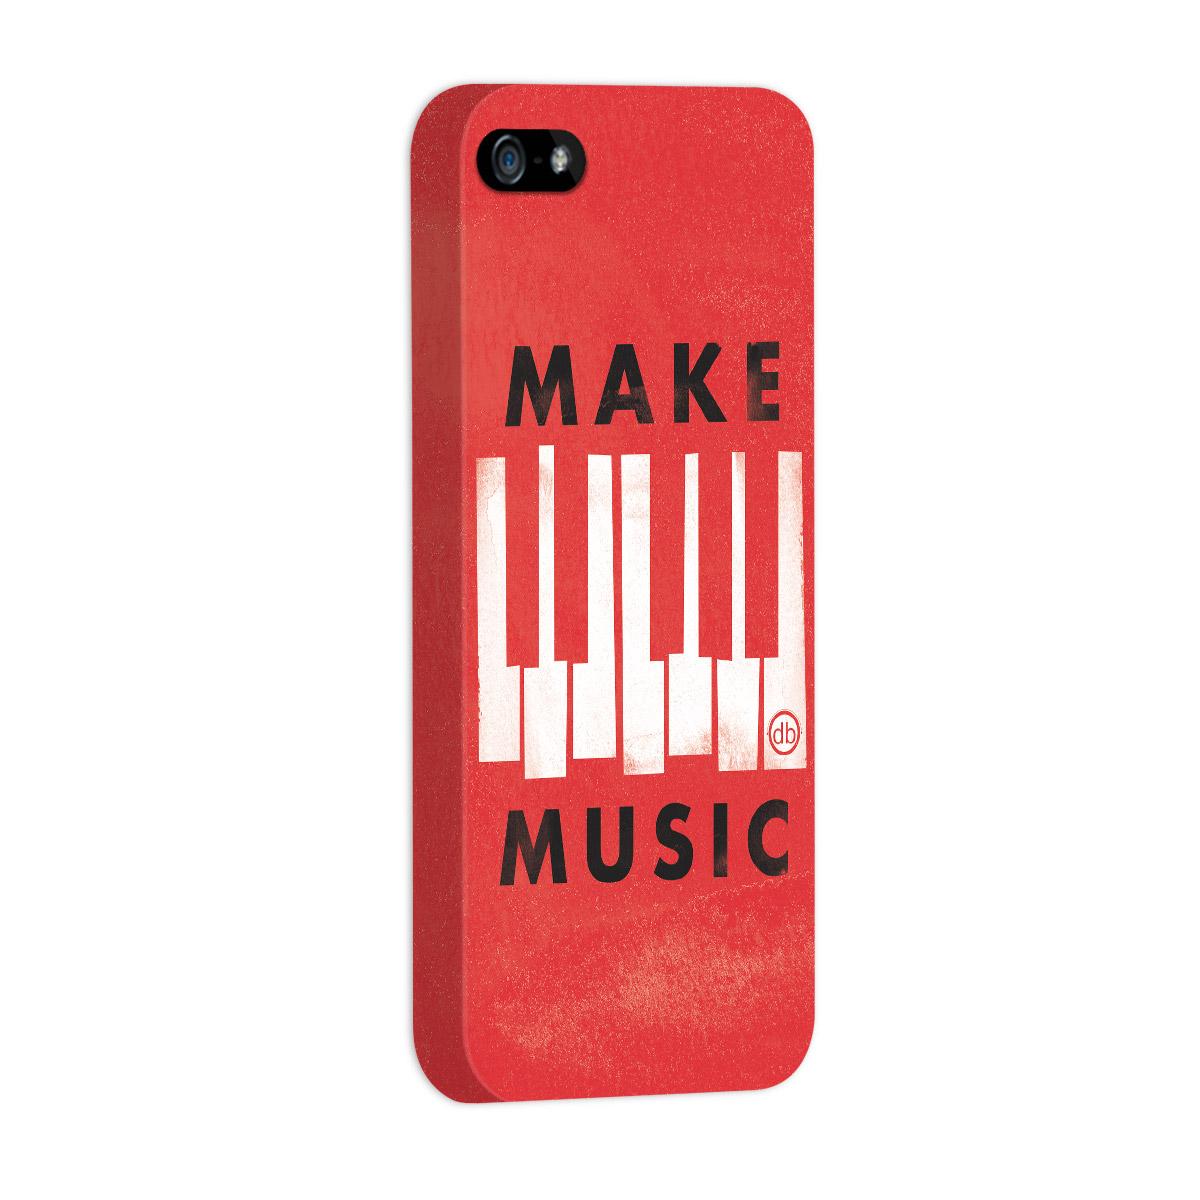 Capa para iPhone 5/5S Dudu Borges Make Music  - bandUP Store Marketplace